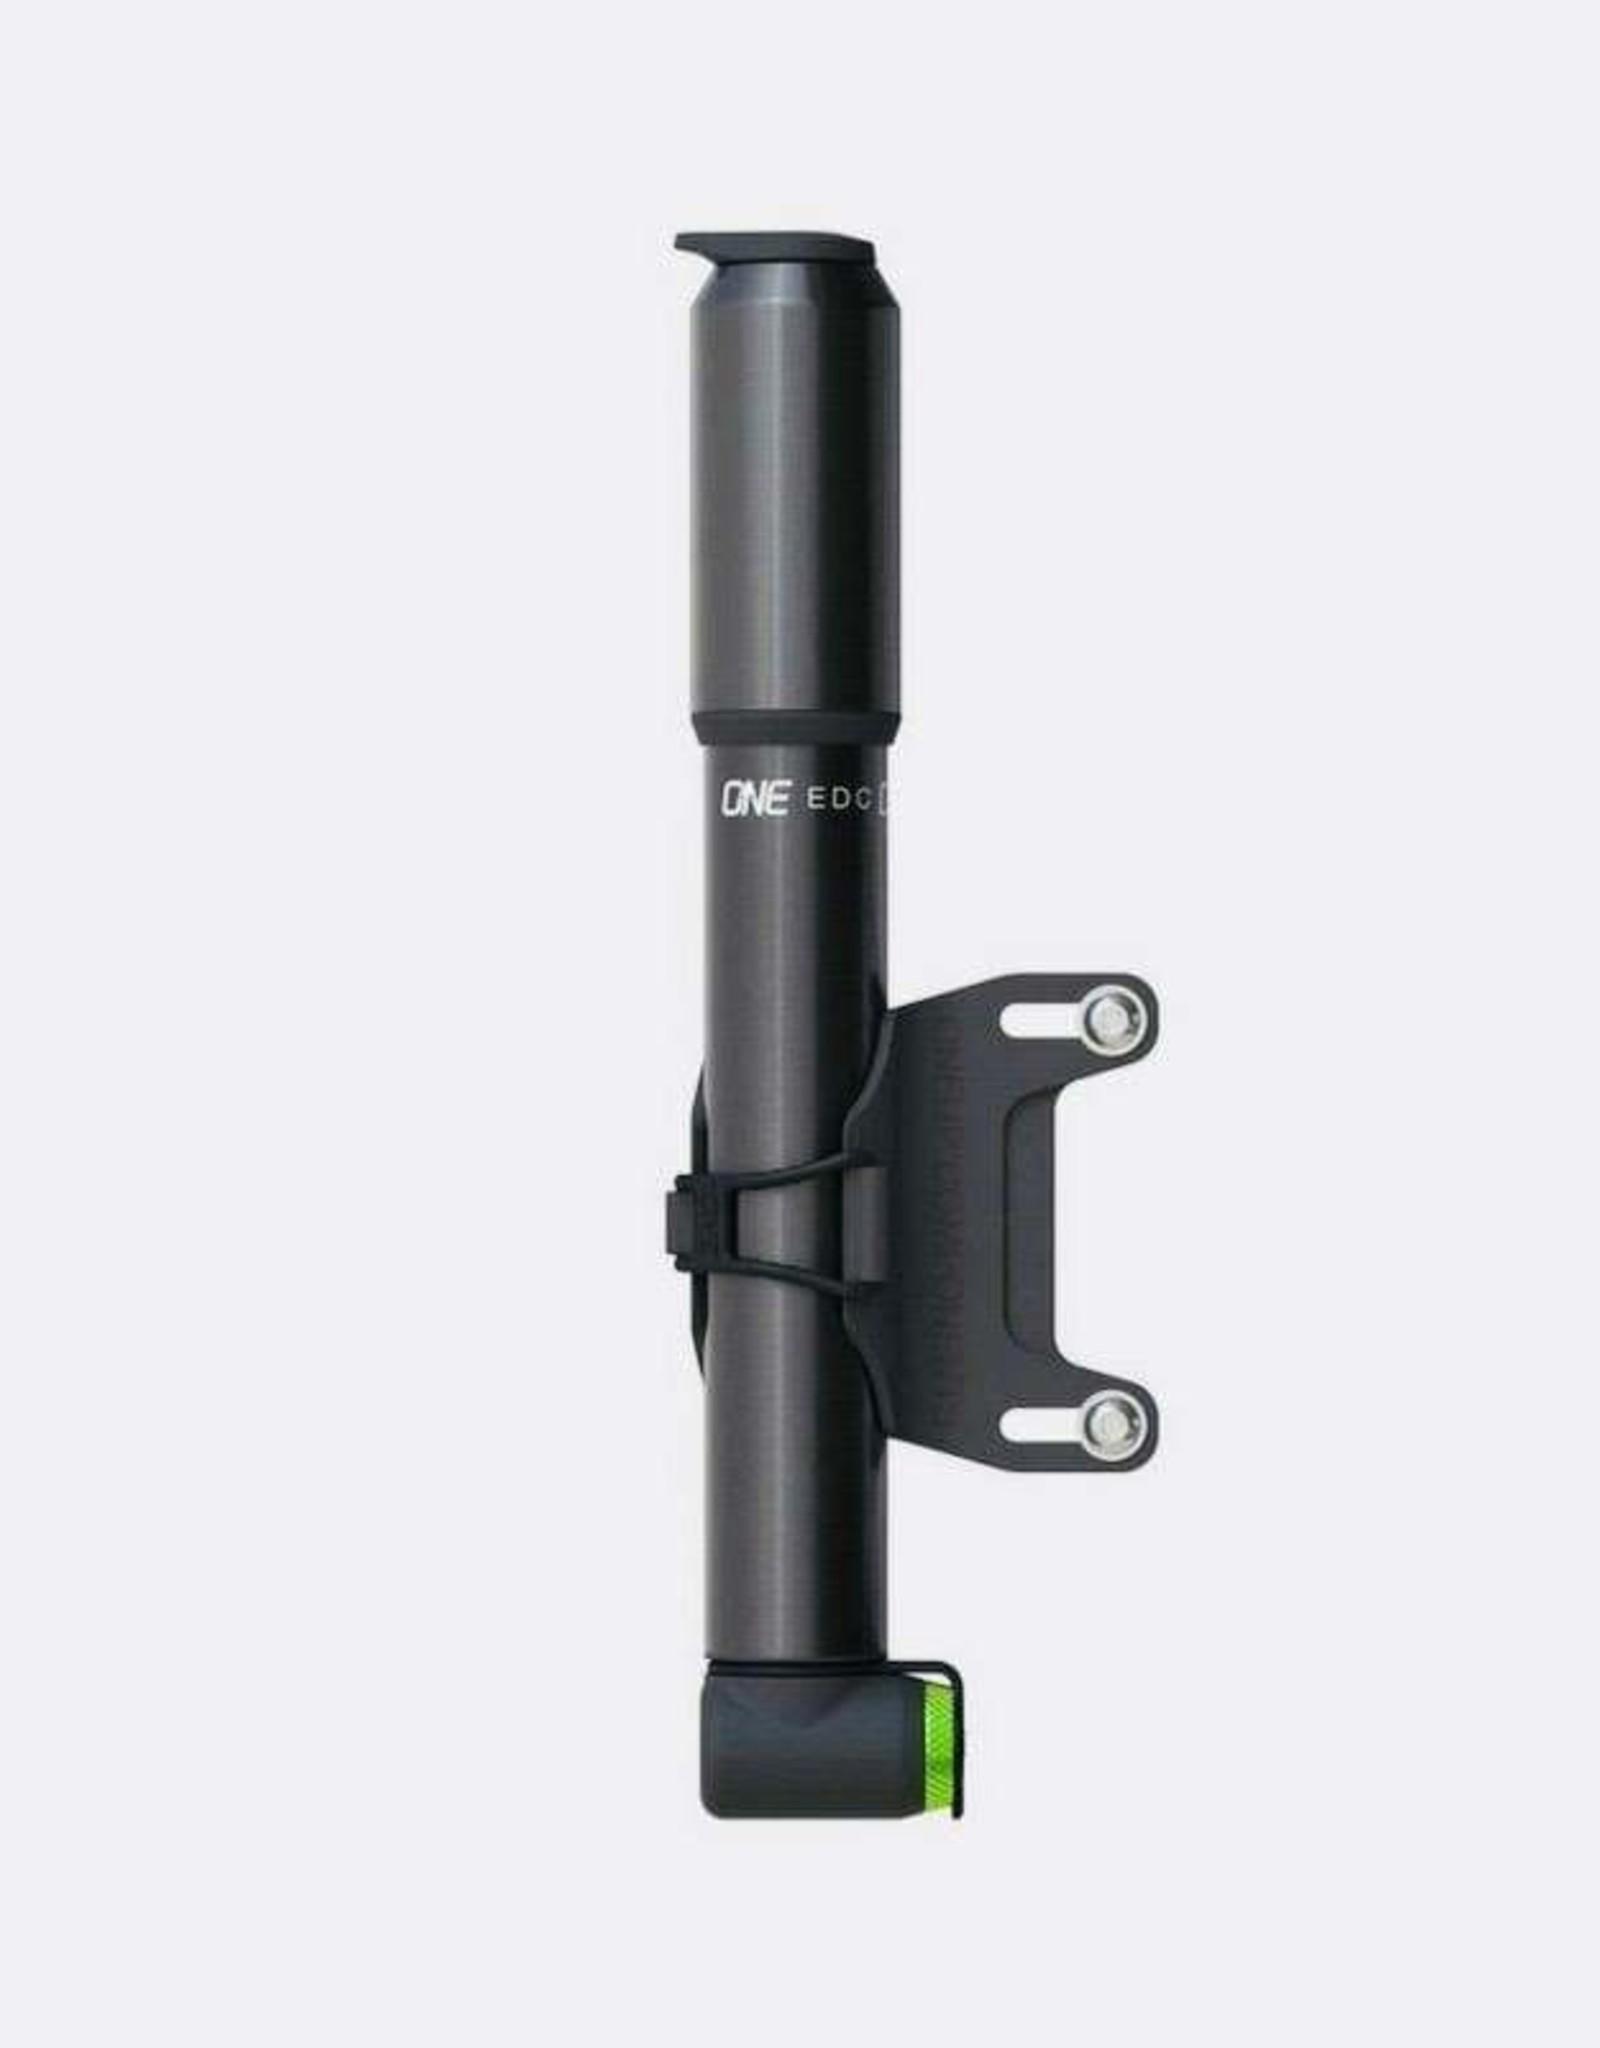 OneUp EDC PUMP - 100cc (EDC tool sold separately)